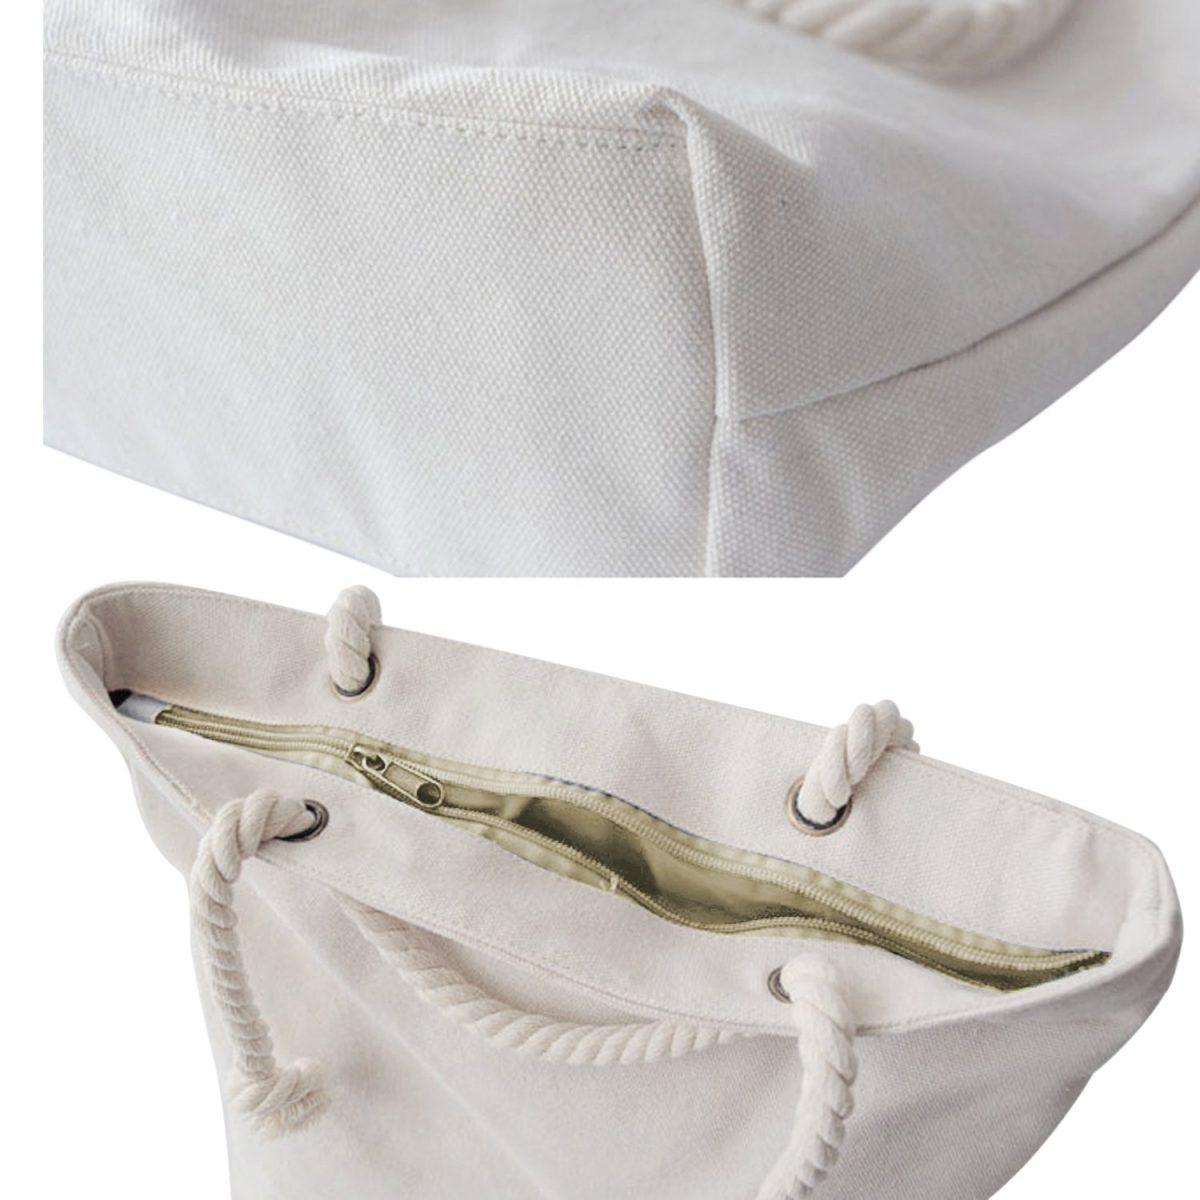 Özel Tasarım Smile Take Up Desenli Fermuarlı Modern Kumaş Çanta Realhomes